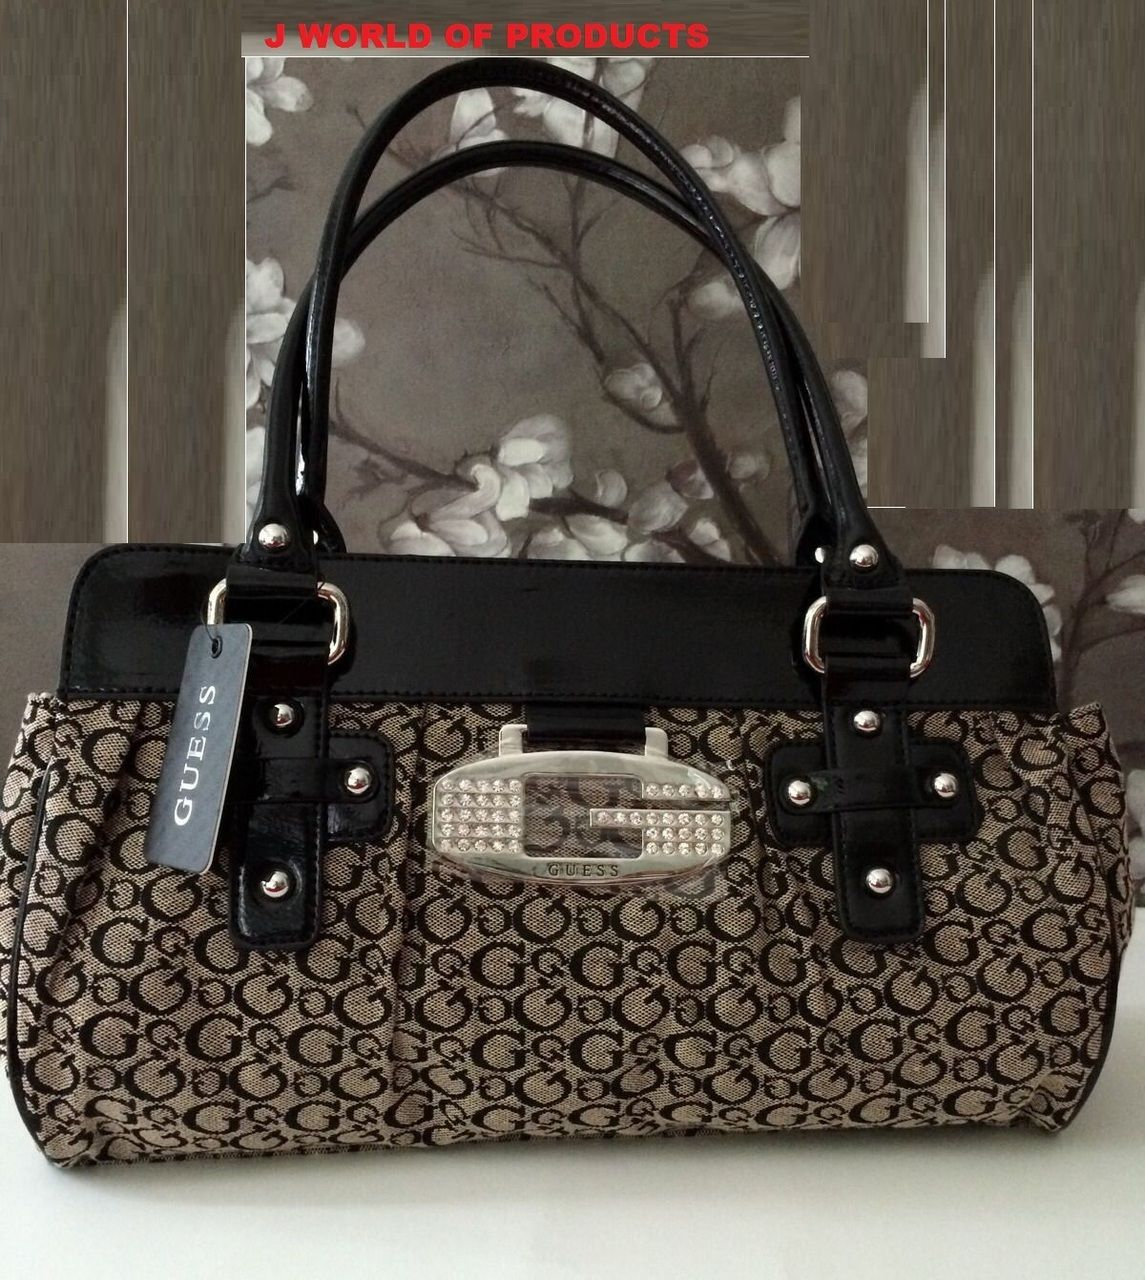 Pin by tonya moe on purses n bags | Guess handbags, Tote